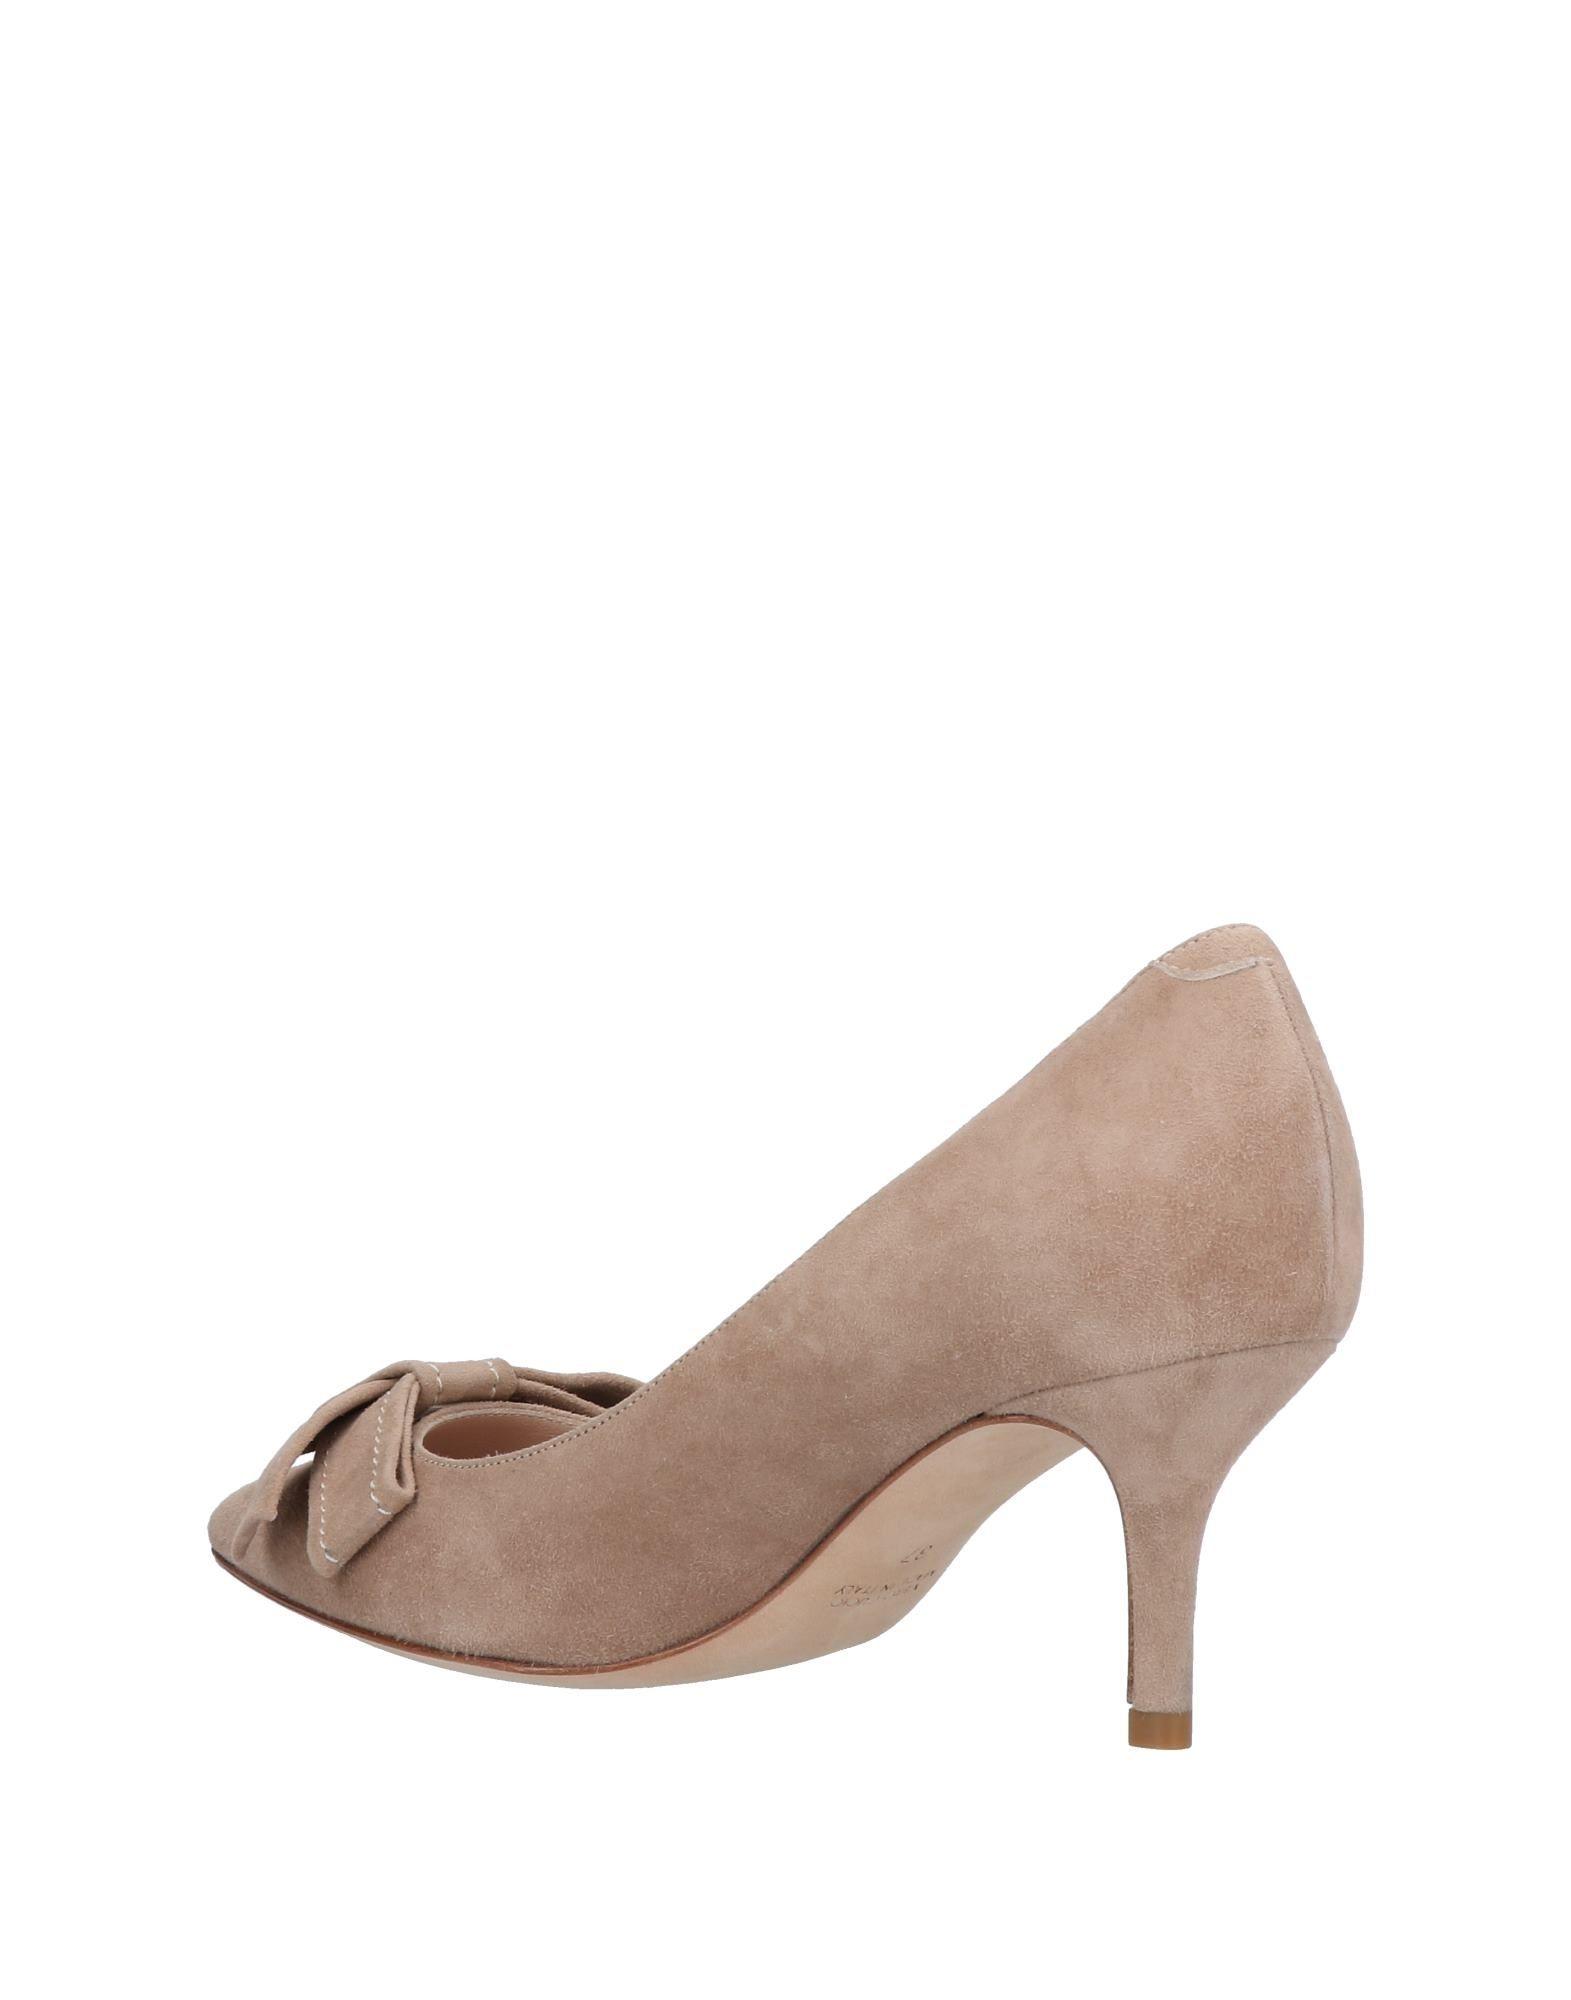 Gut um Pumps billige Schuhe zu tragenGrandinetti Pumps um Damen  11460565FW a3222c